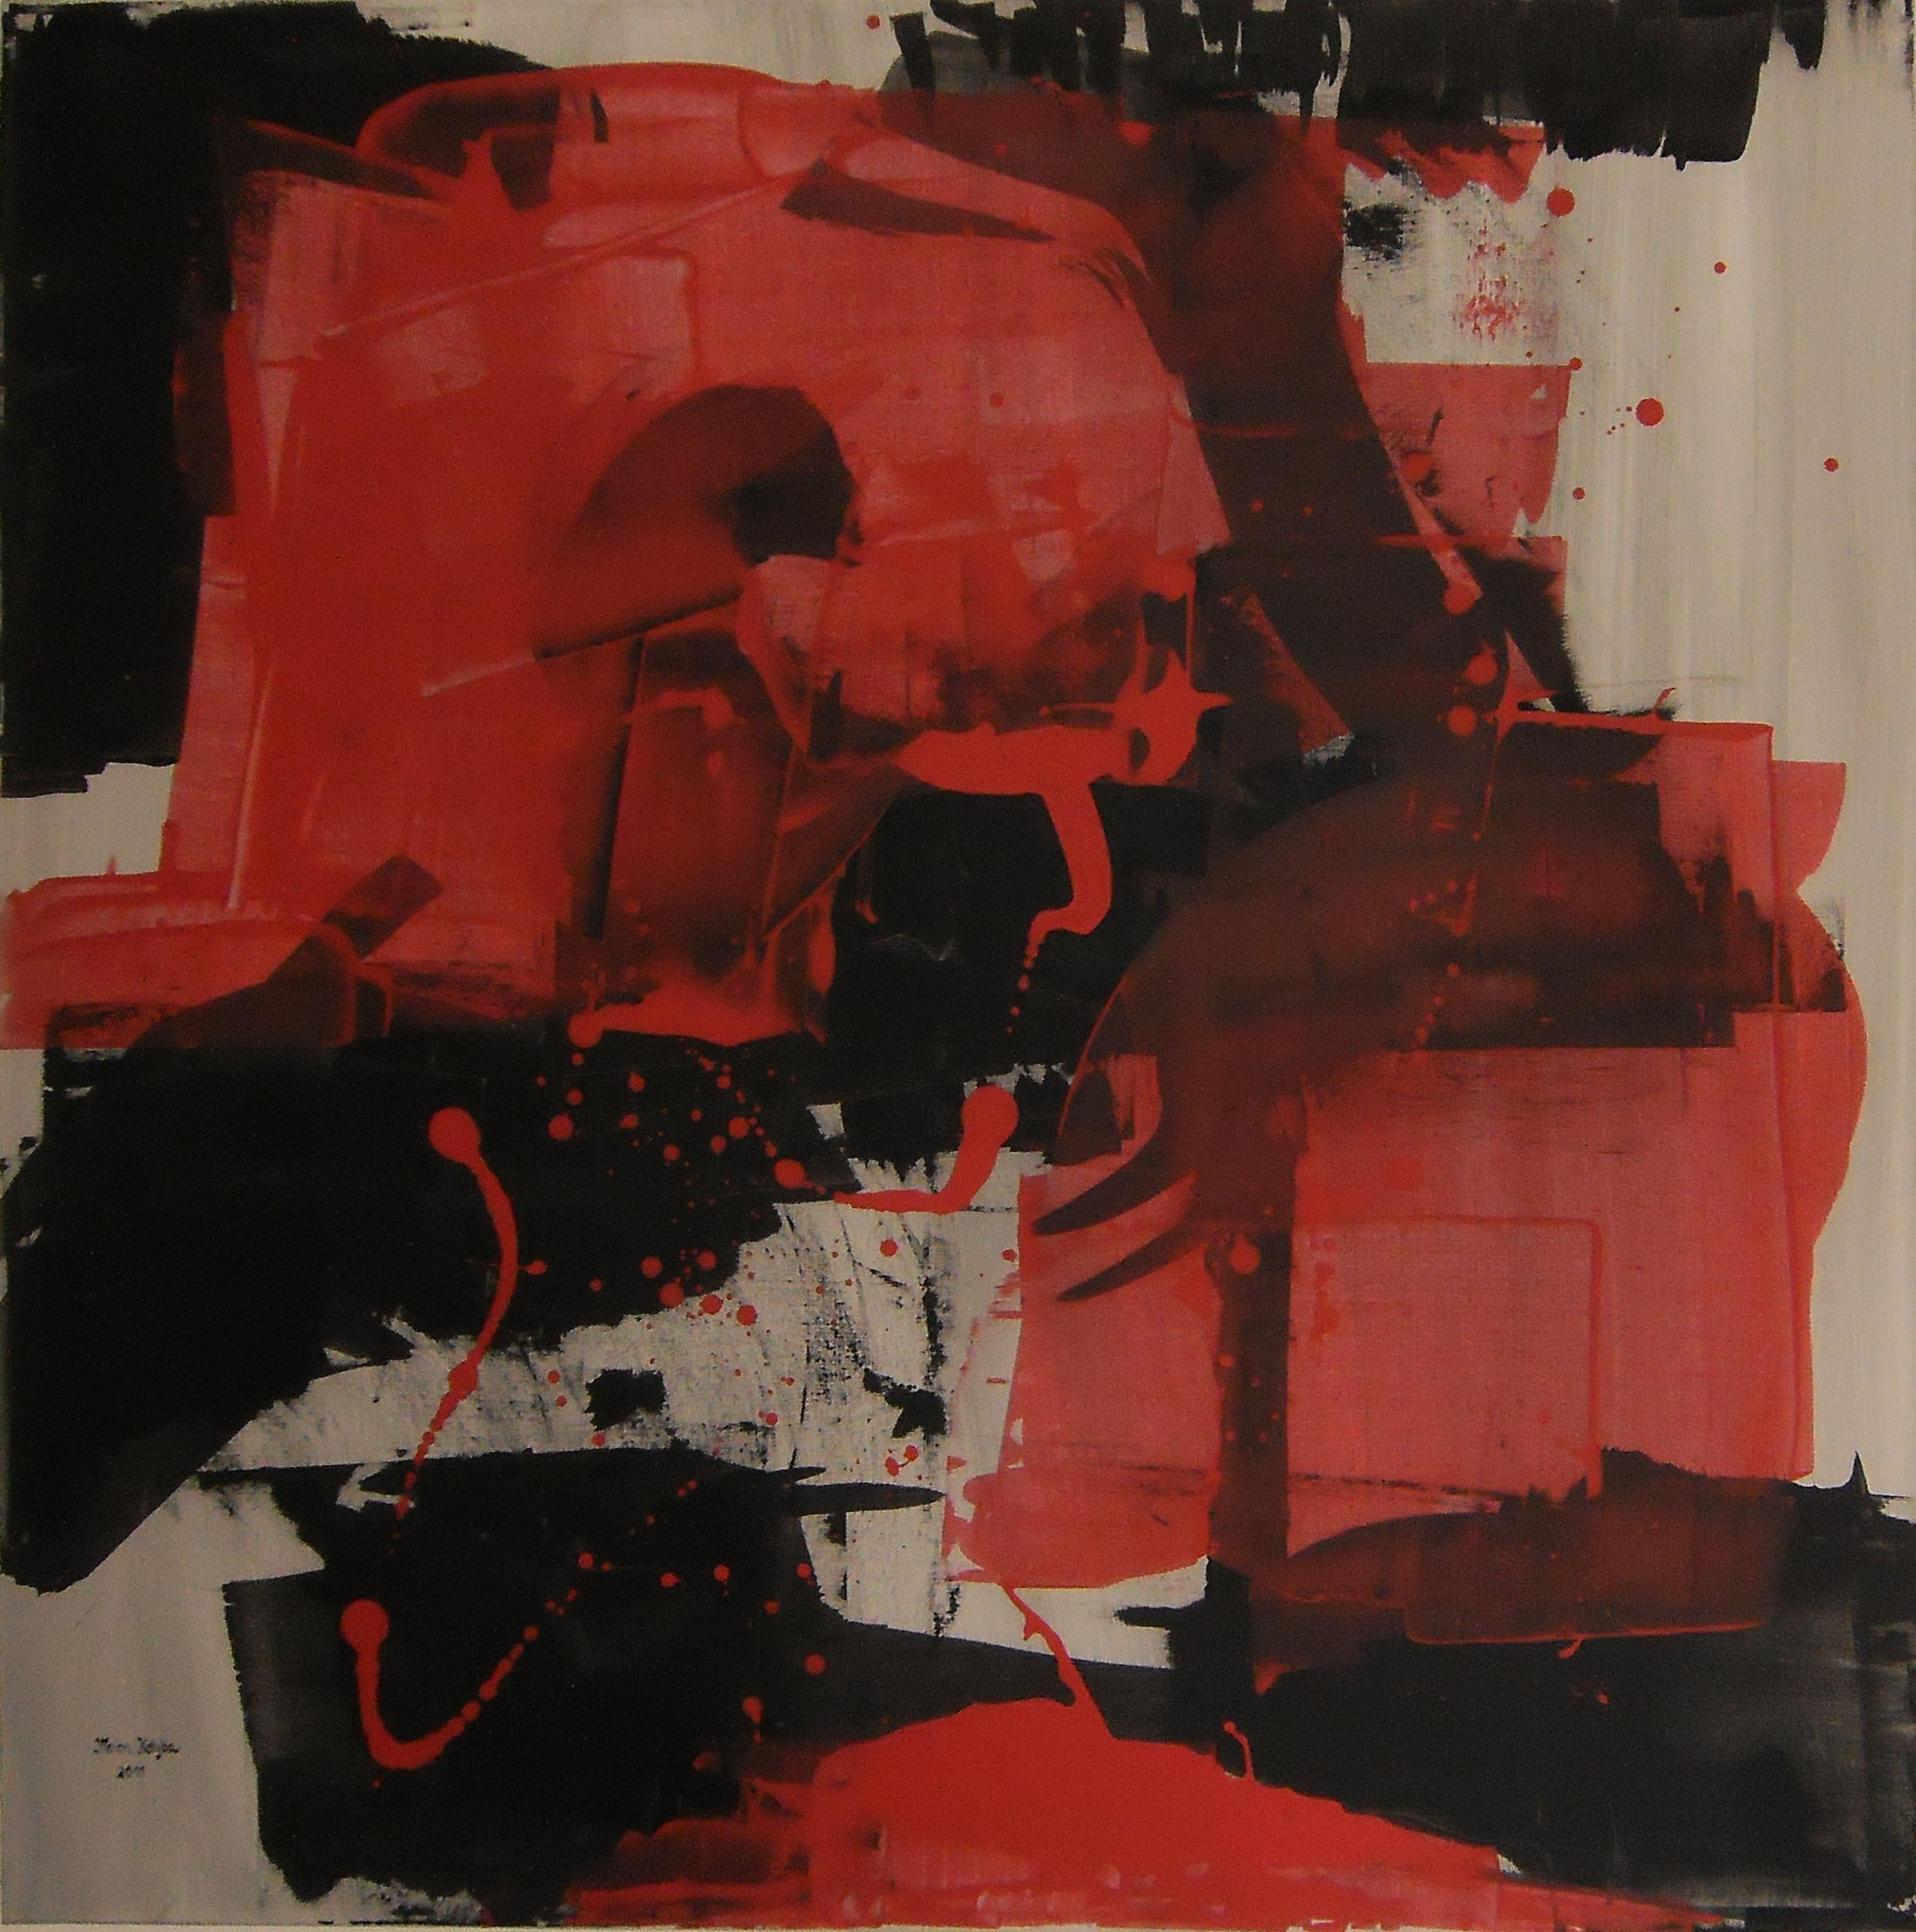 Rosso Nero 100 x 100 x 2 cm